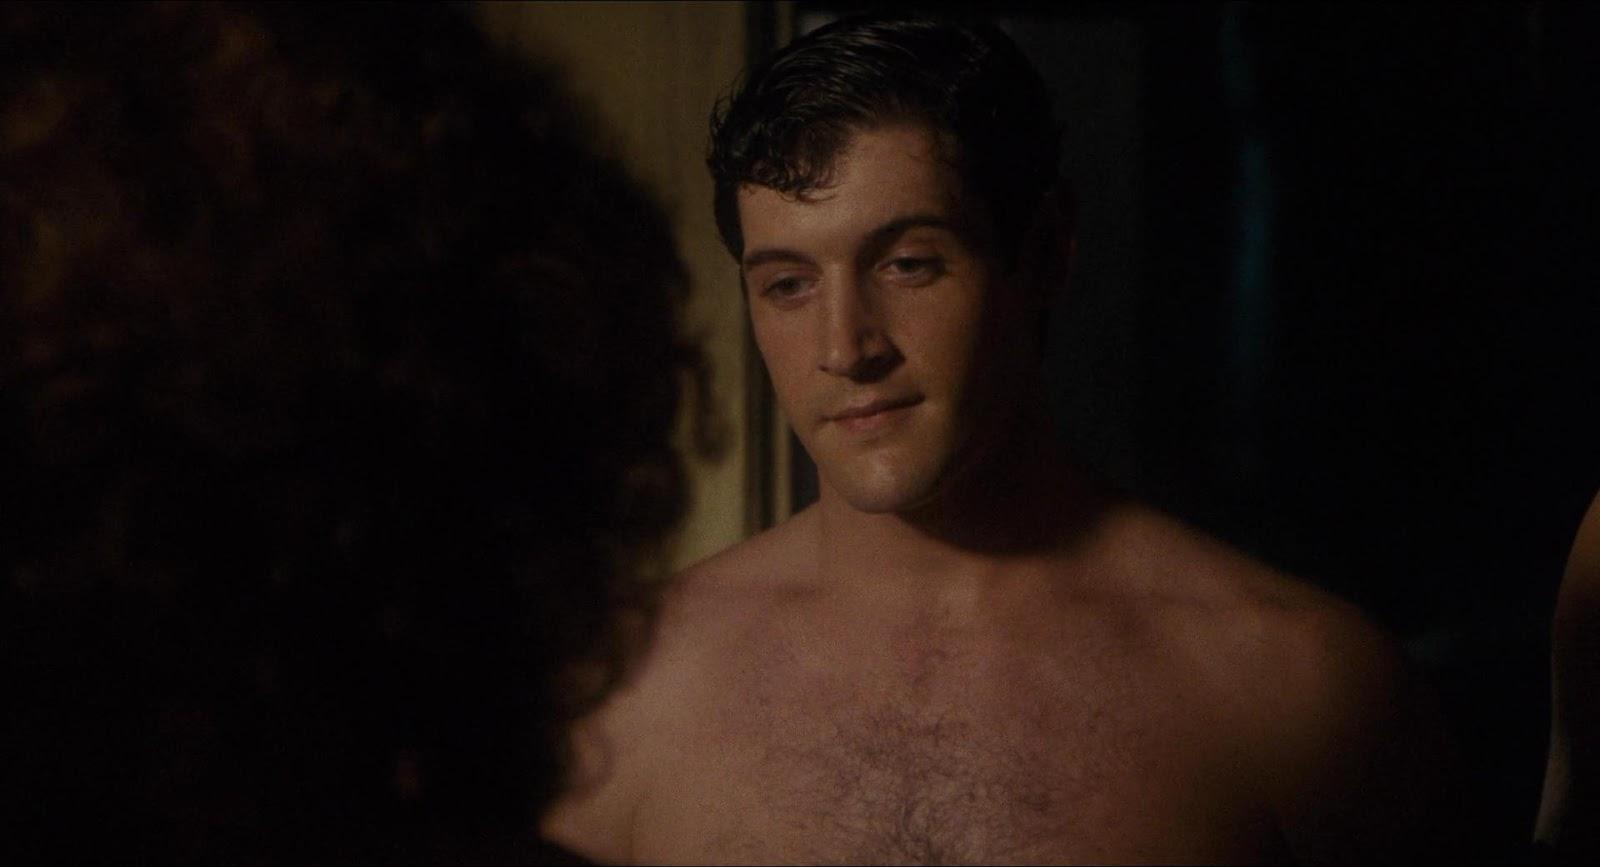 tony-ganios-naked-girls-hot-bodies